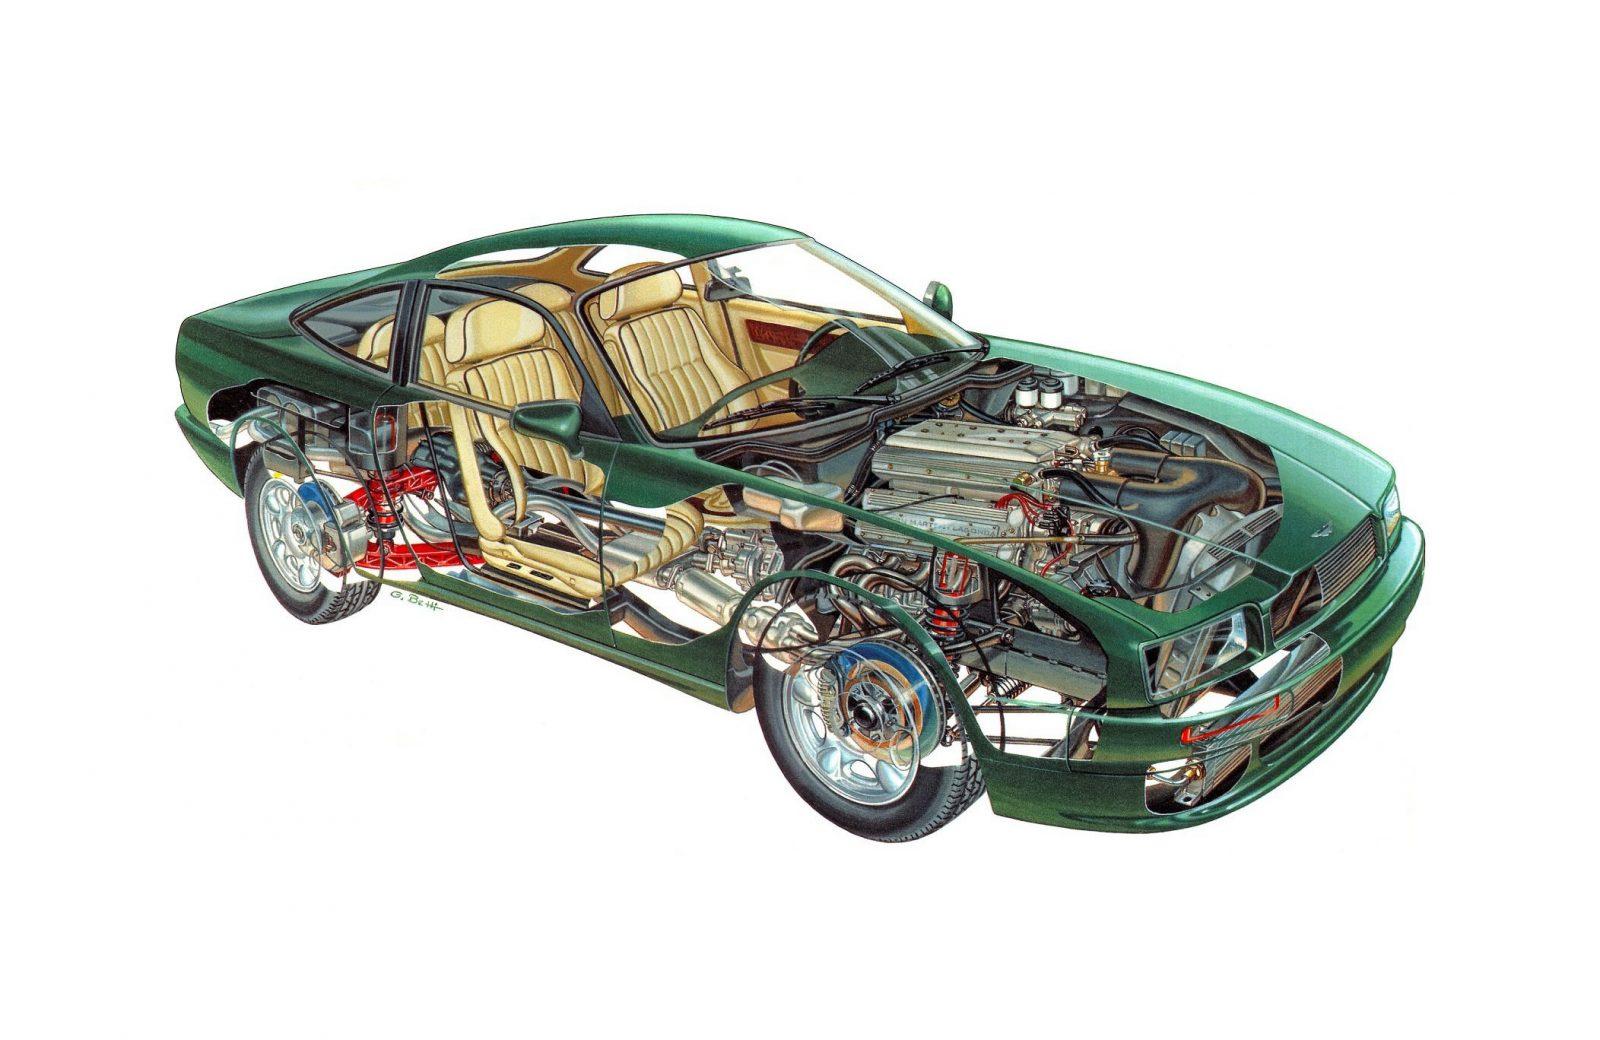 Aston Martin V8 Virage Cutaway 1600x1040 - Aston Martin Virage Cutaway